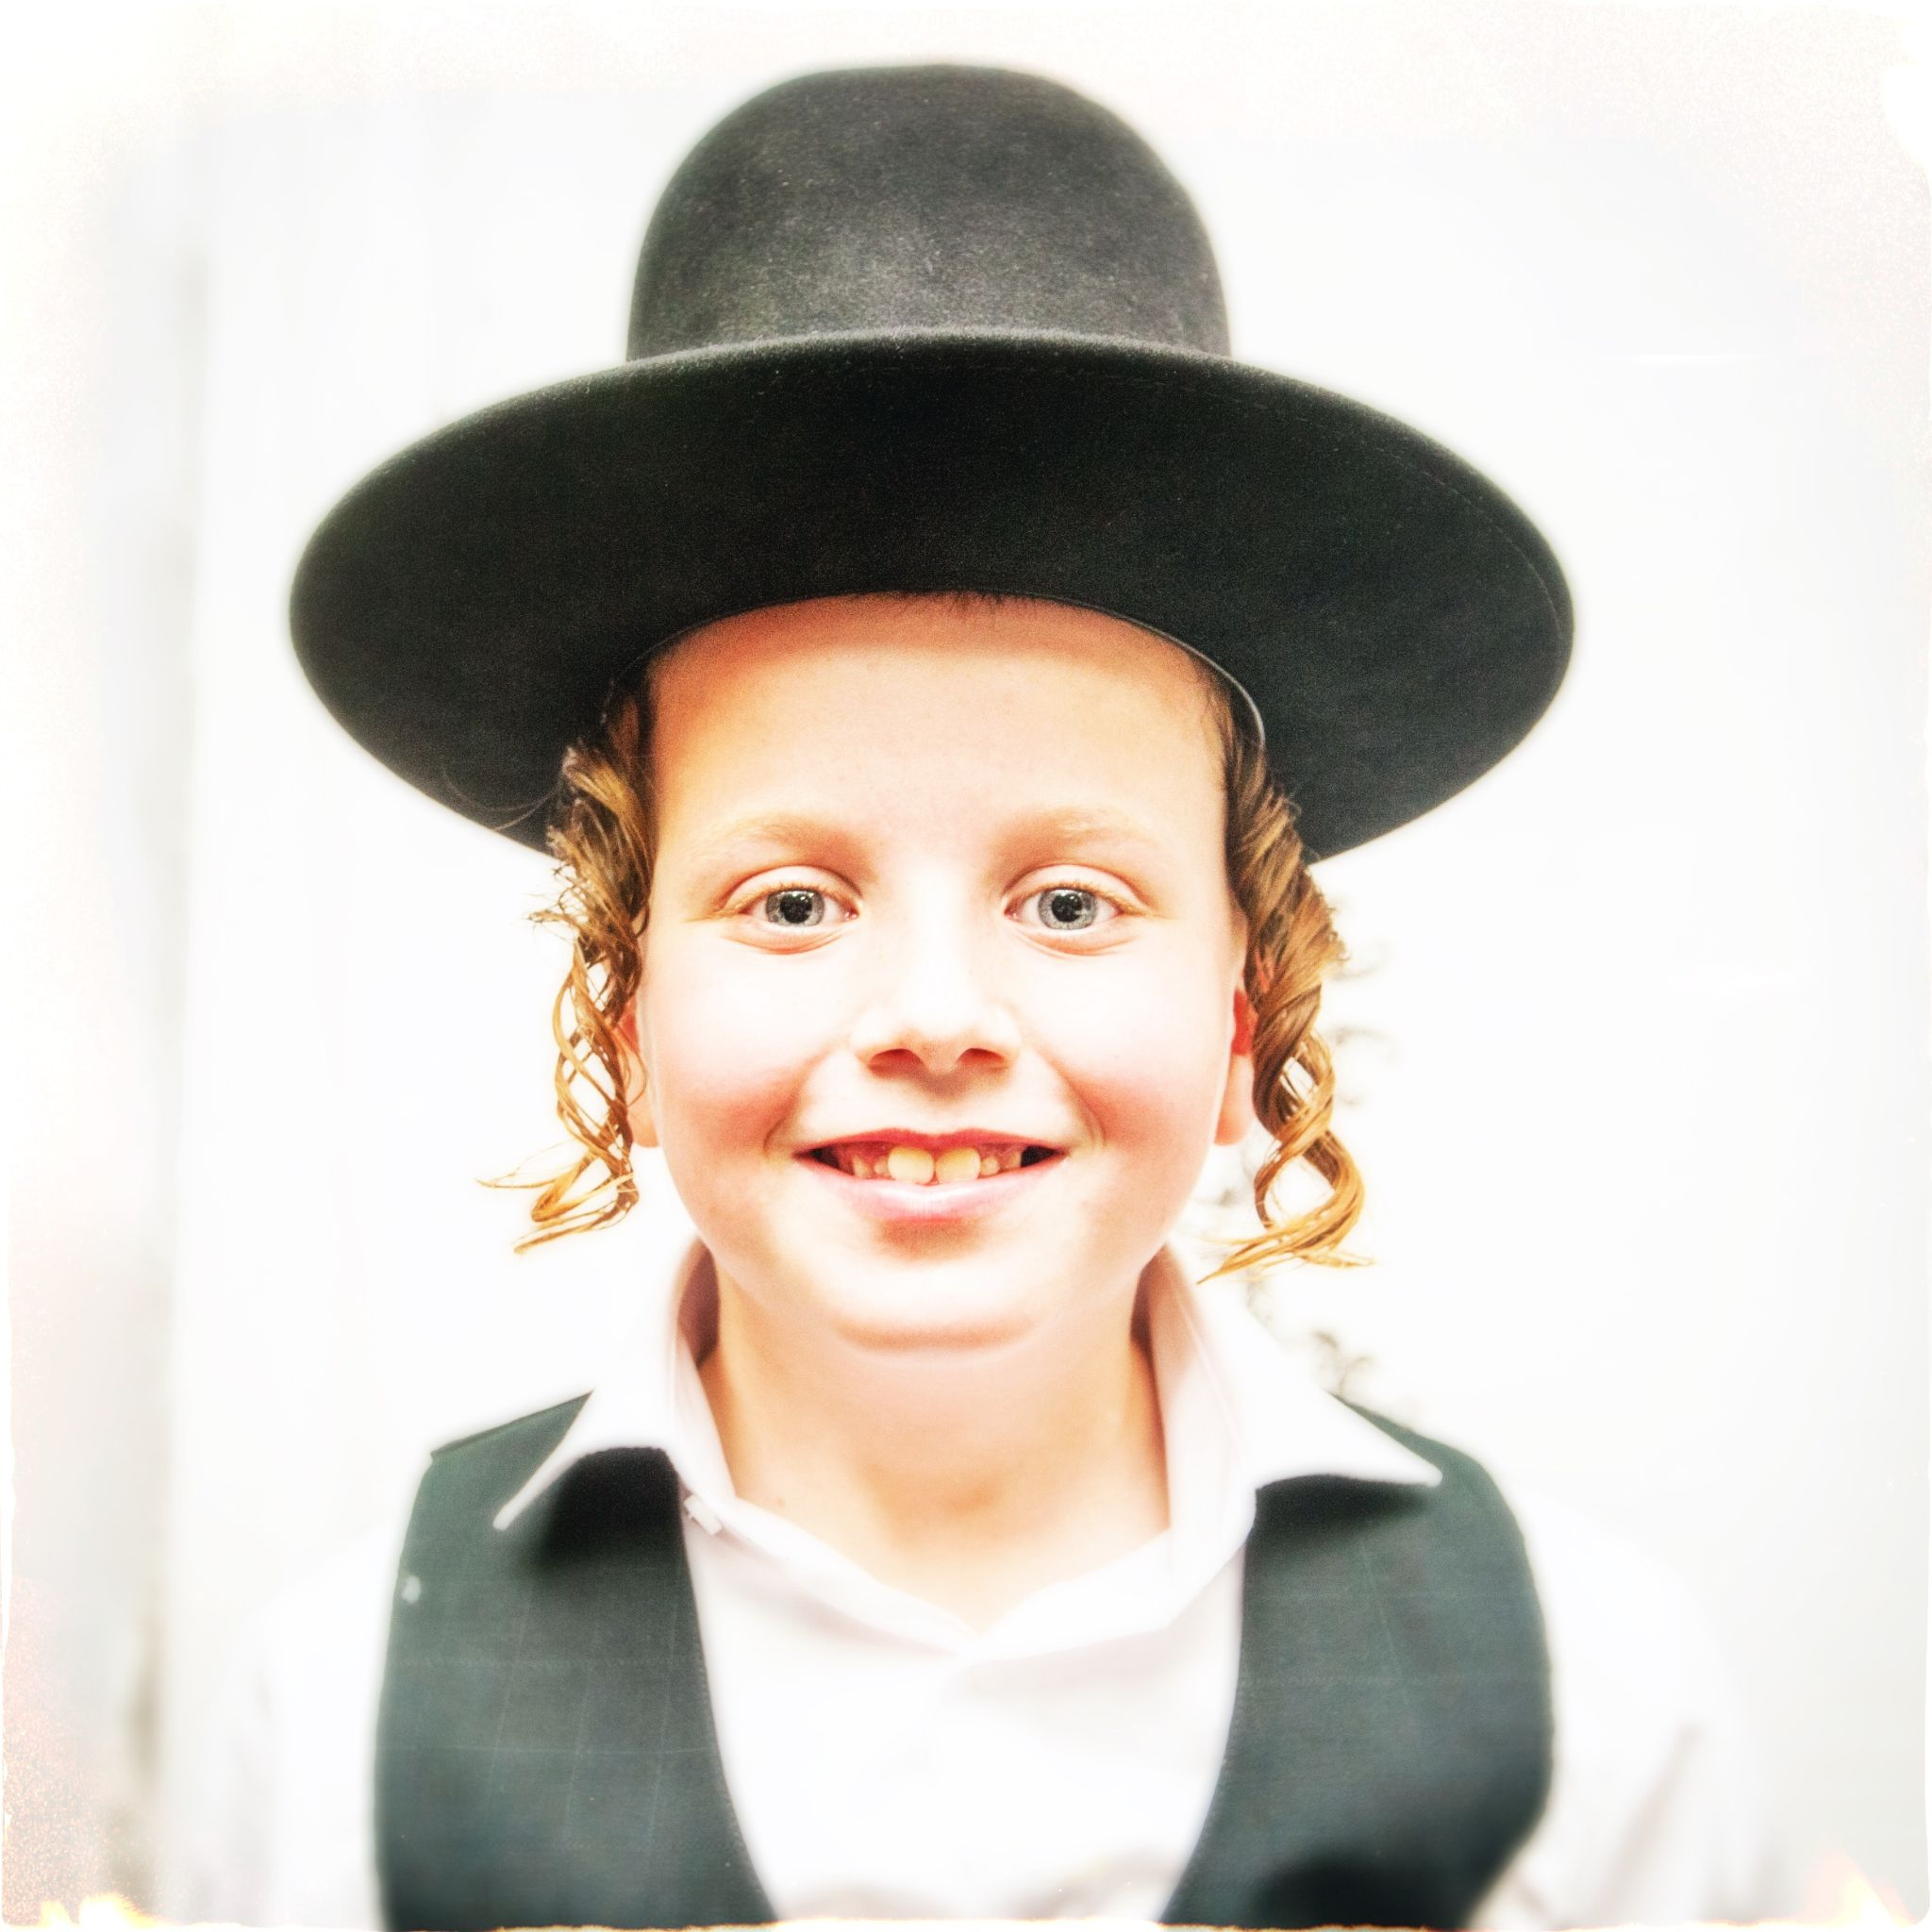 young Jewish Boy in Black Hat by Max Shamota